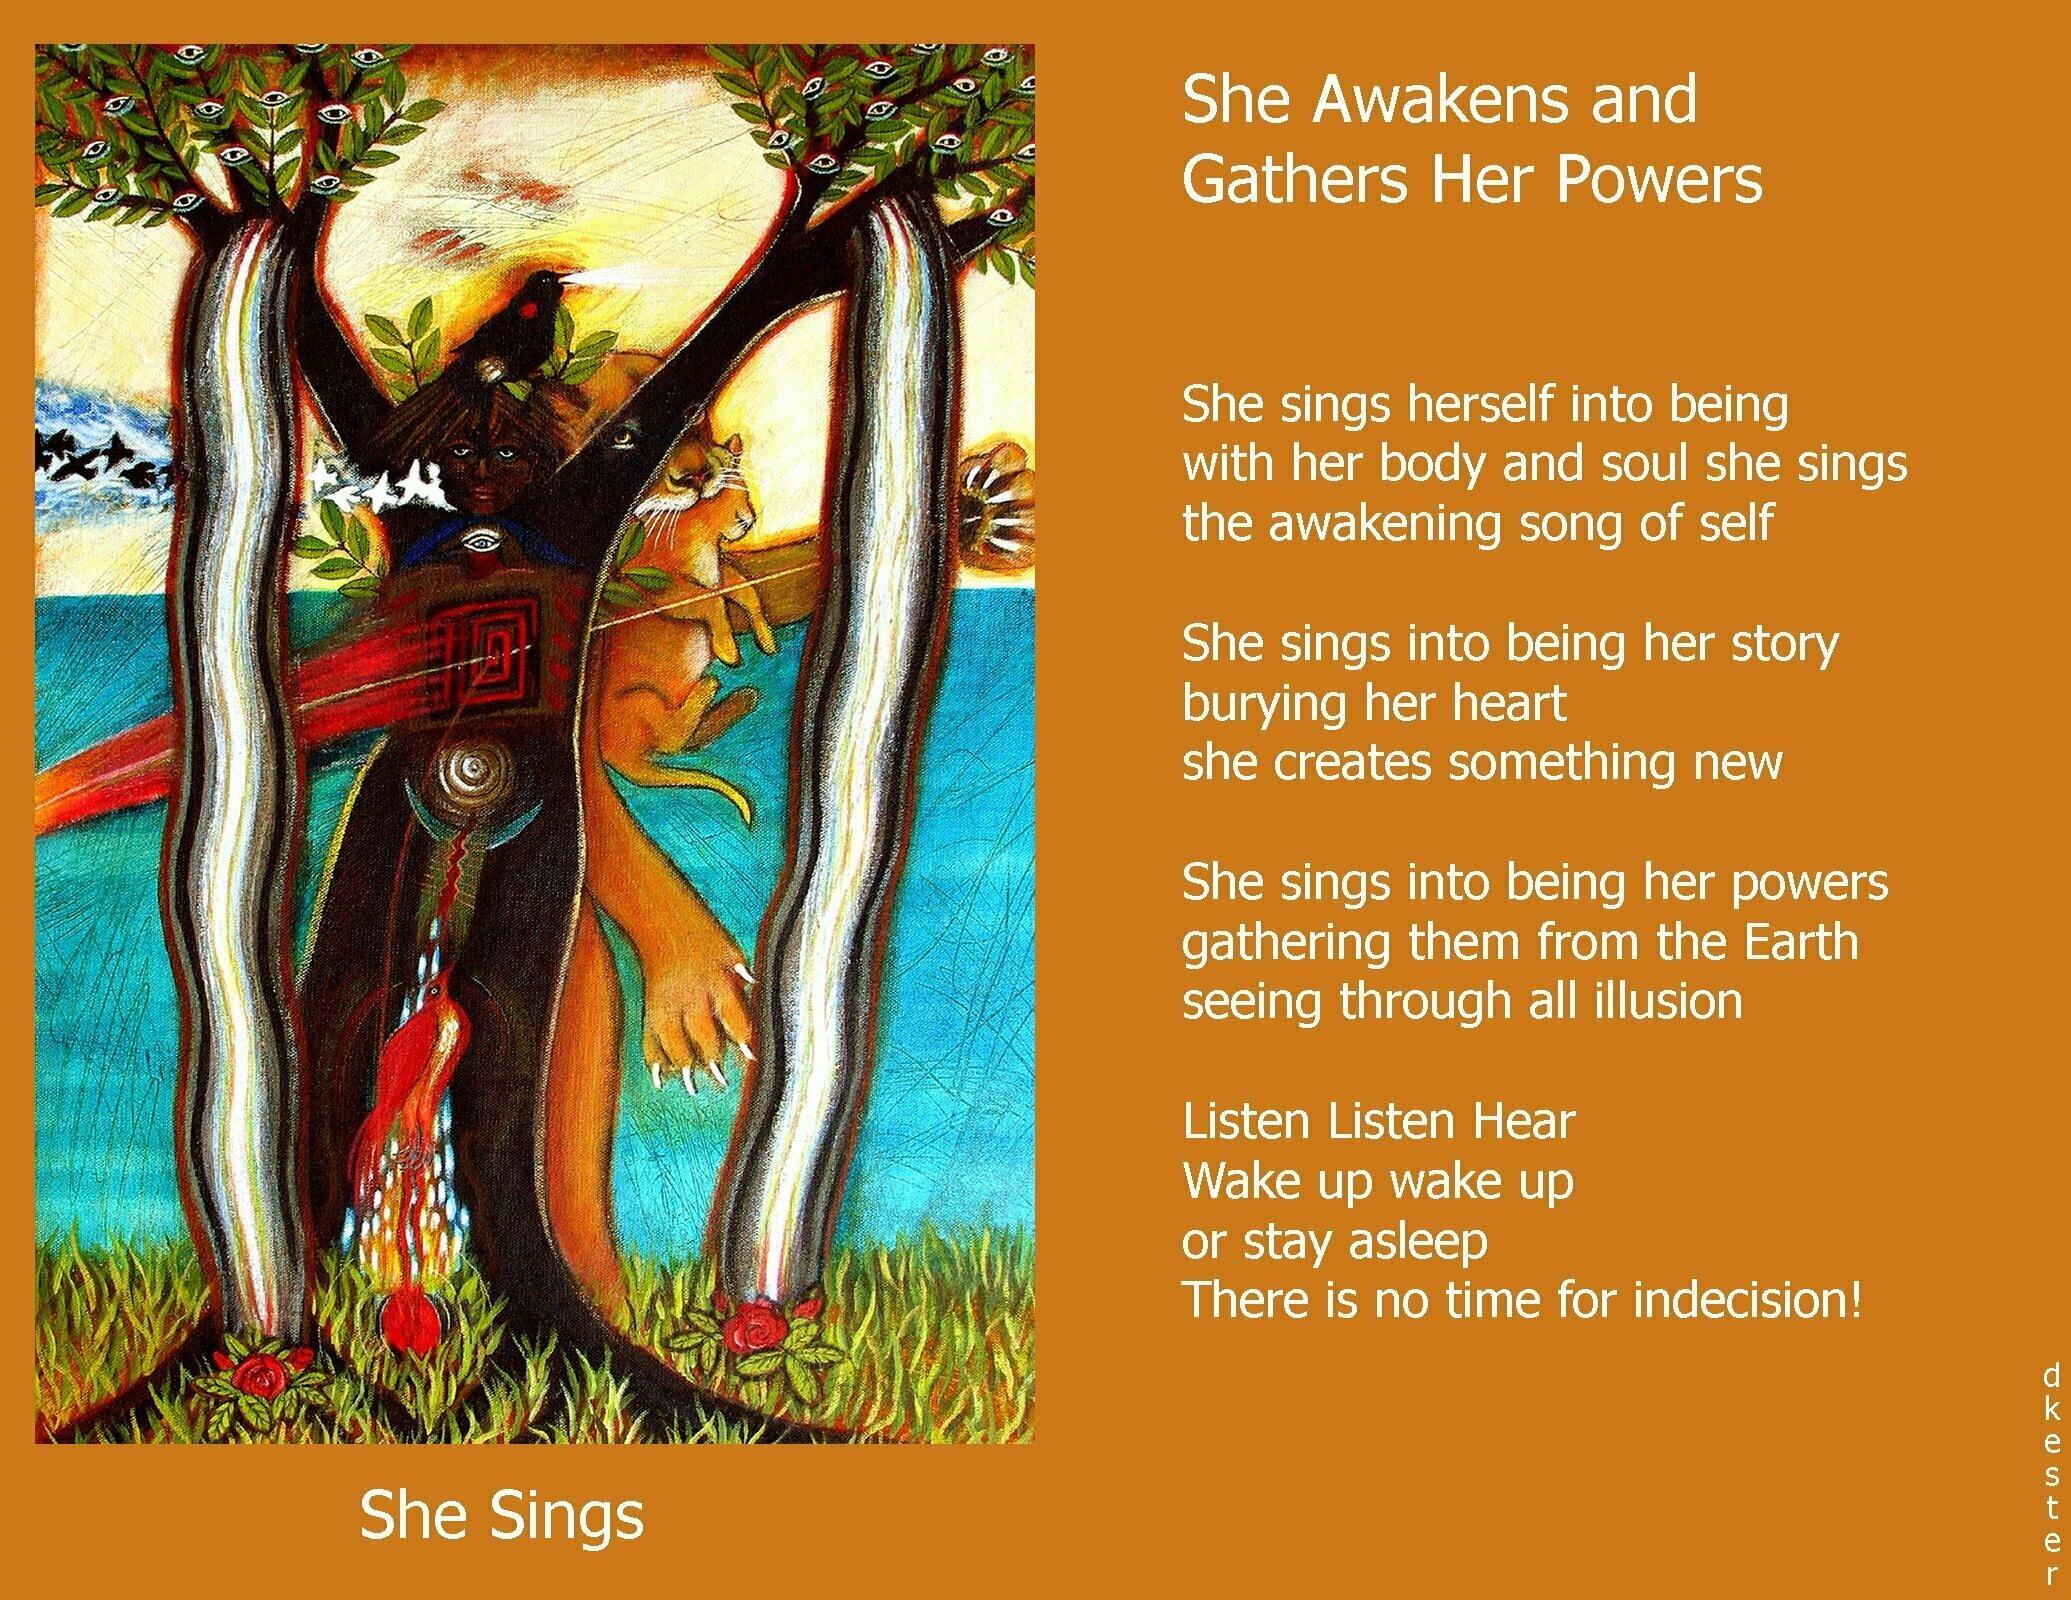 Denise Kester: She Awakens and Gathers Her Powers